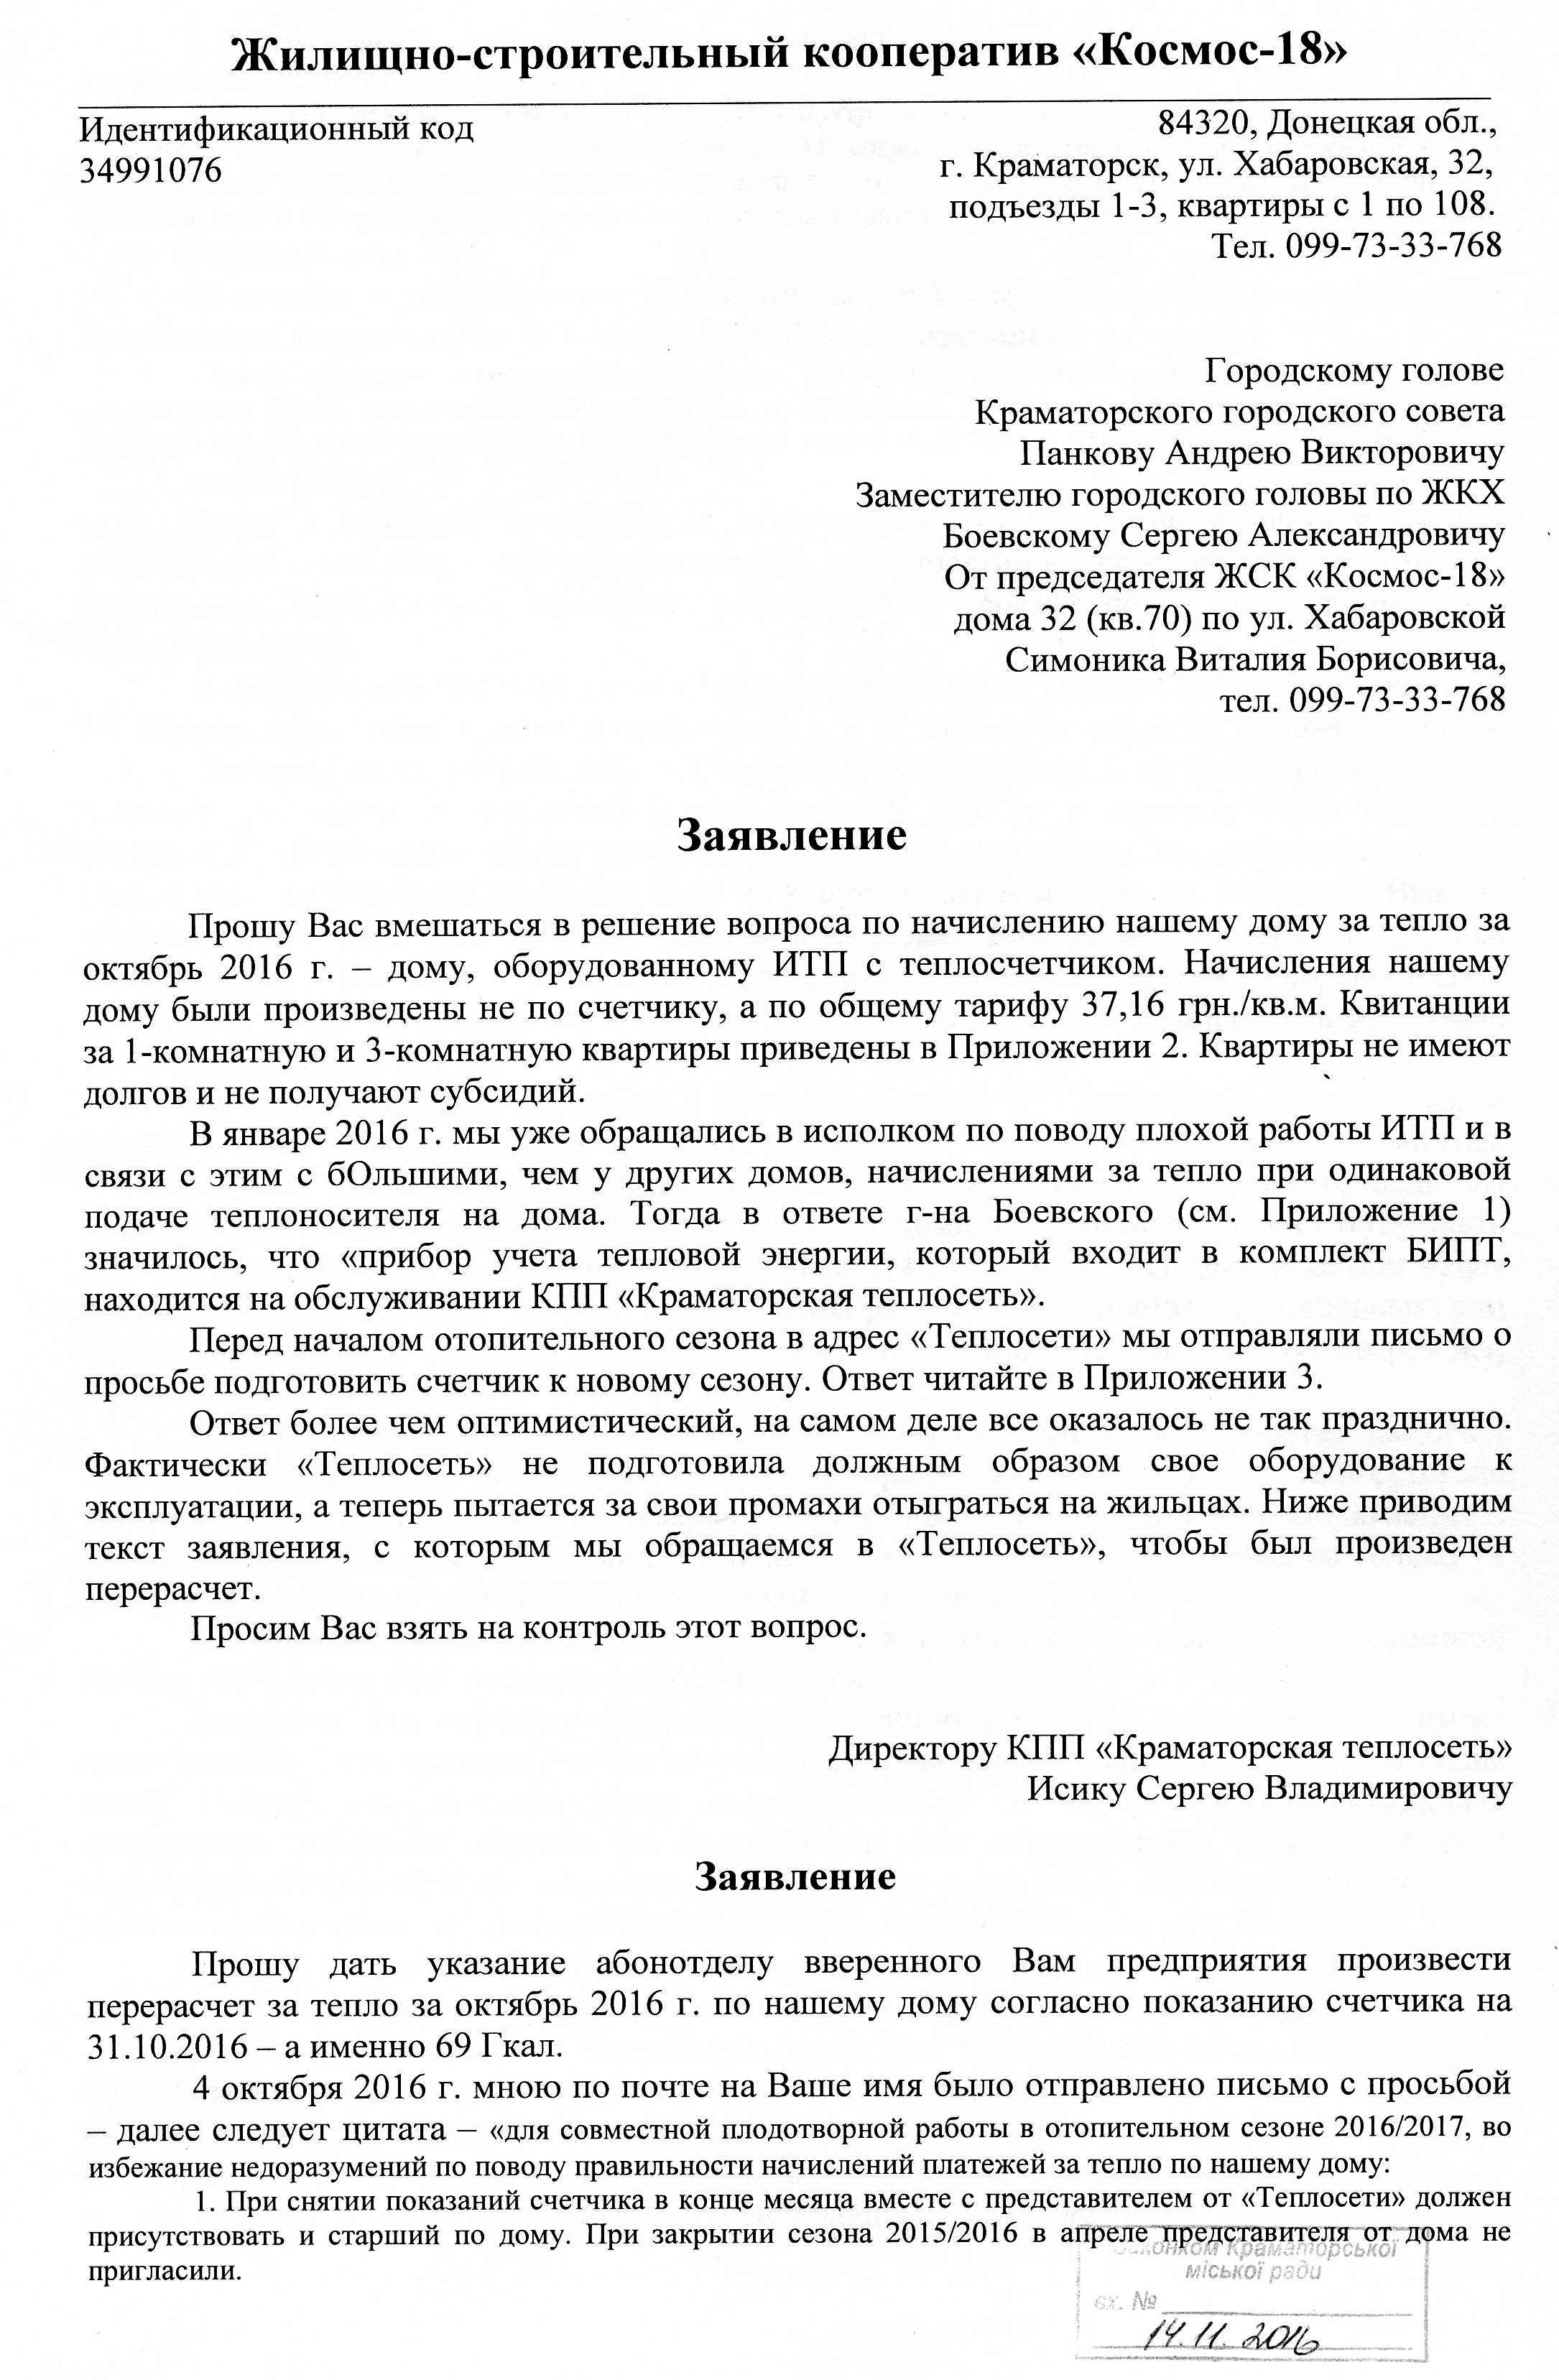 https://img-fotki.yandex.ru/get/30536/248142895.0/0_180fef_51e89c98_orig